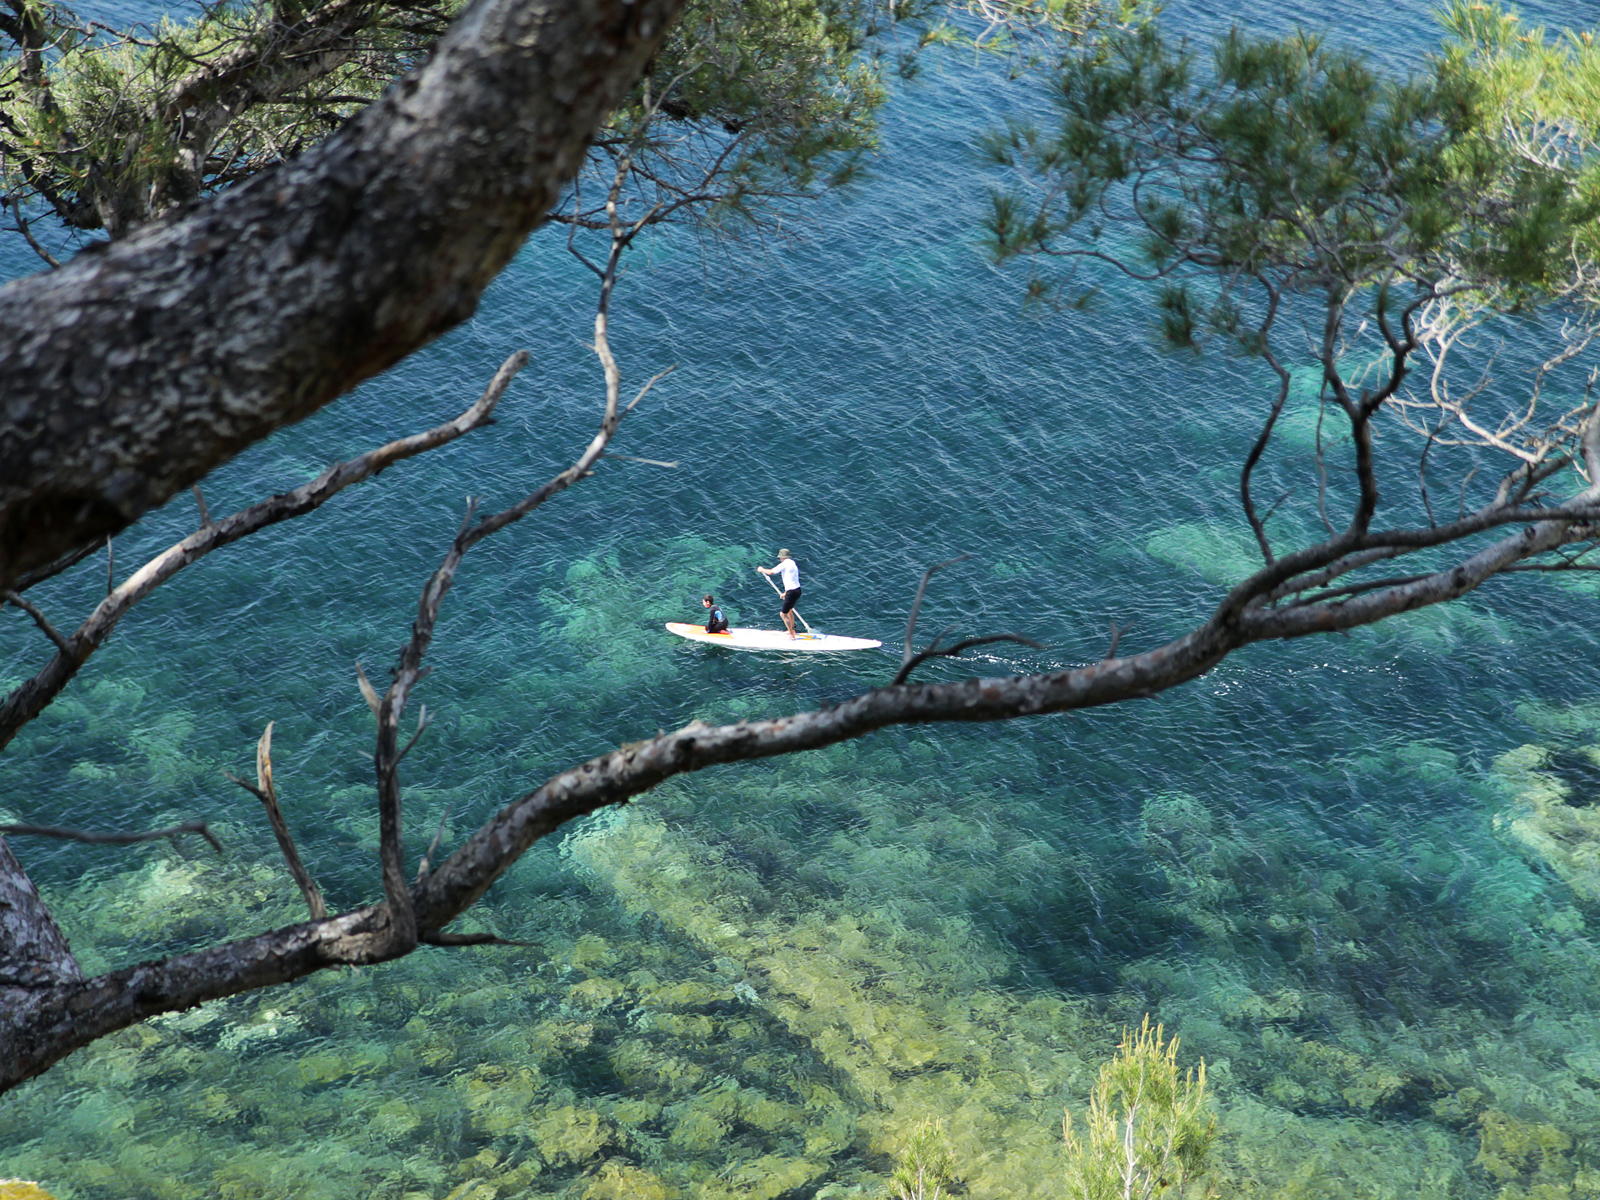 toulon-provence-mediterranee-tourisme-Paddle-au-Pradet©-Grégory-Vuylsteker-Ville-du-Pradet